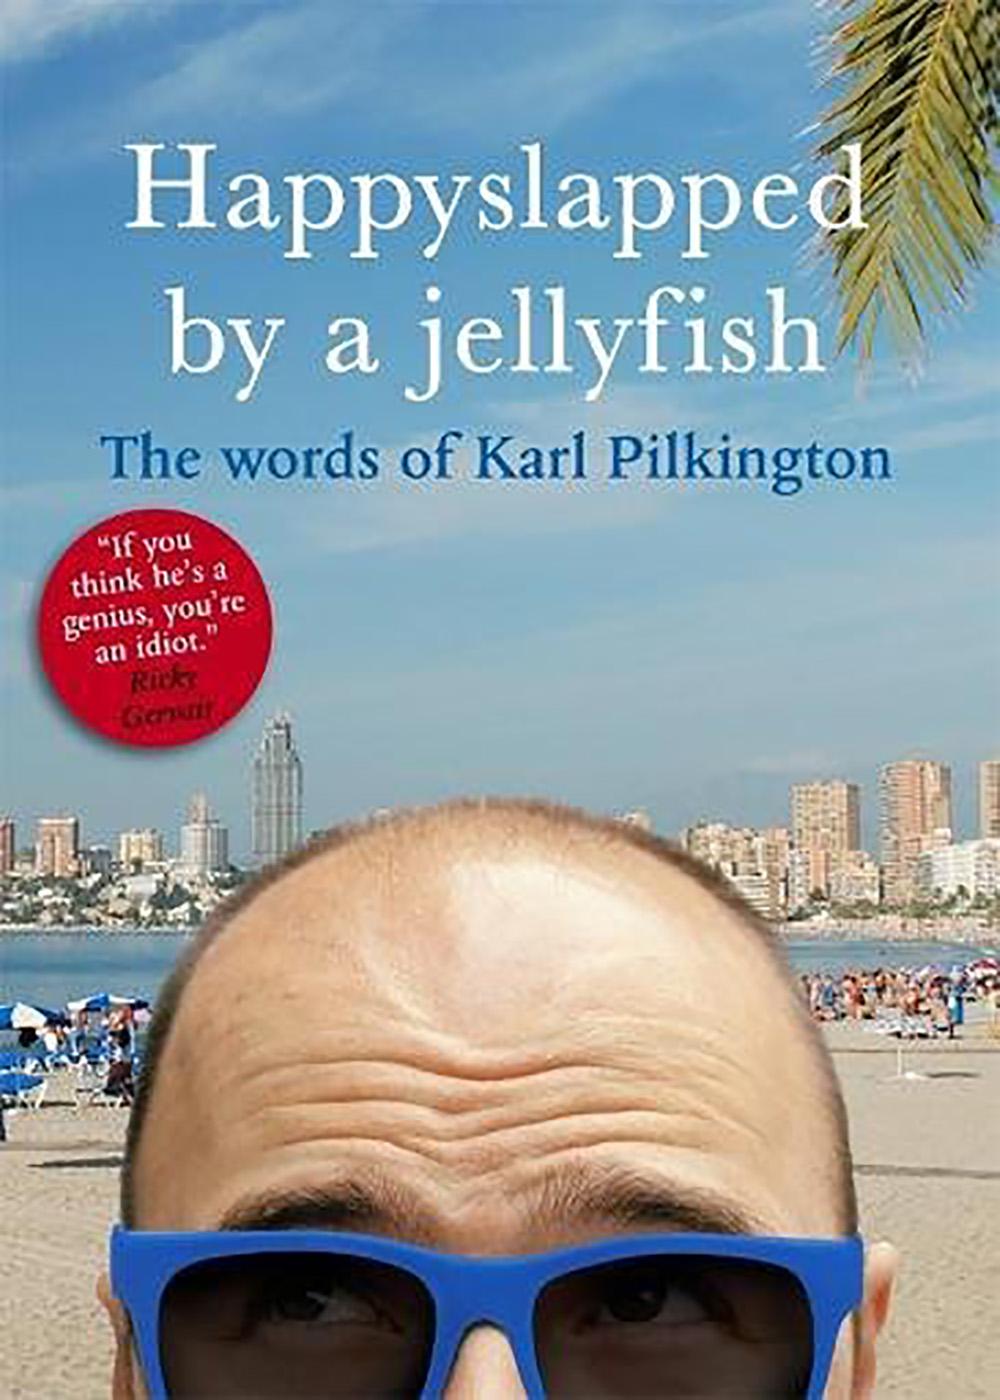 Karl Pilkington - Happyslapped By A Jellyfish